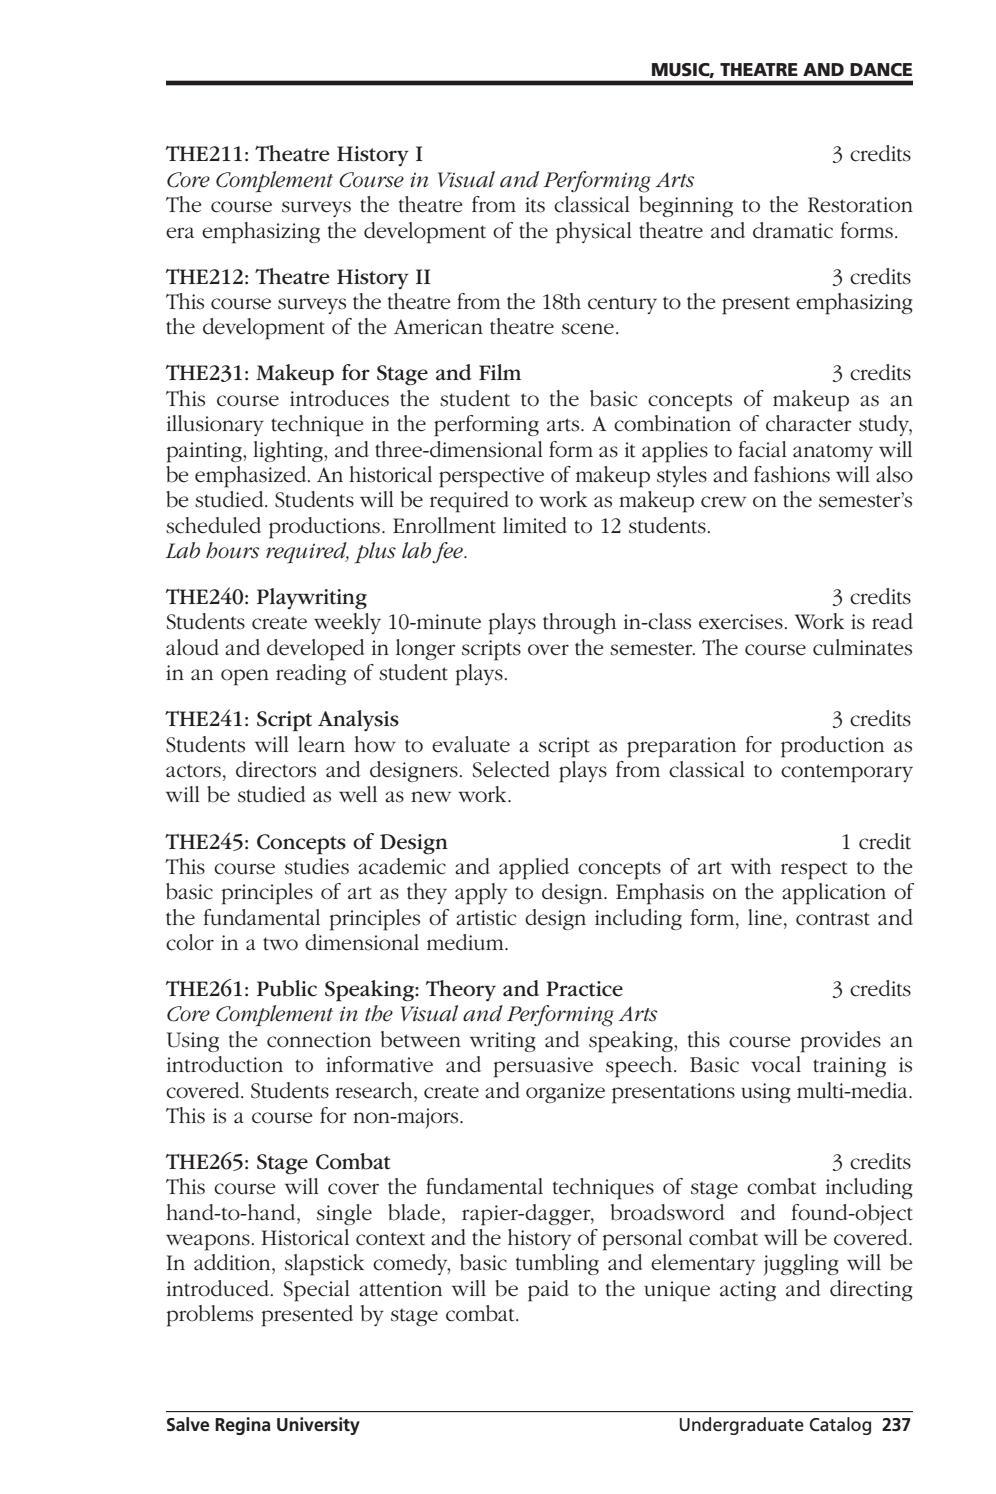 Salve Regina University Undergraduate Catalog 2013-2014 by